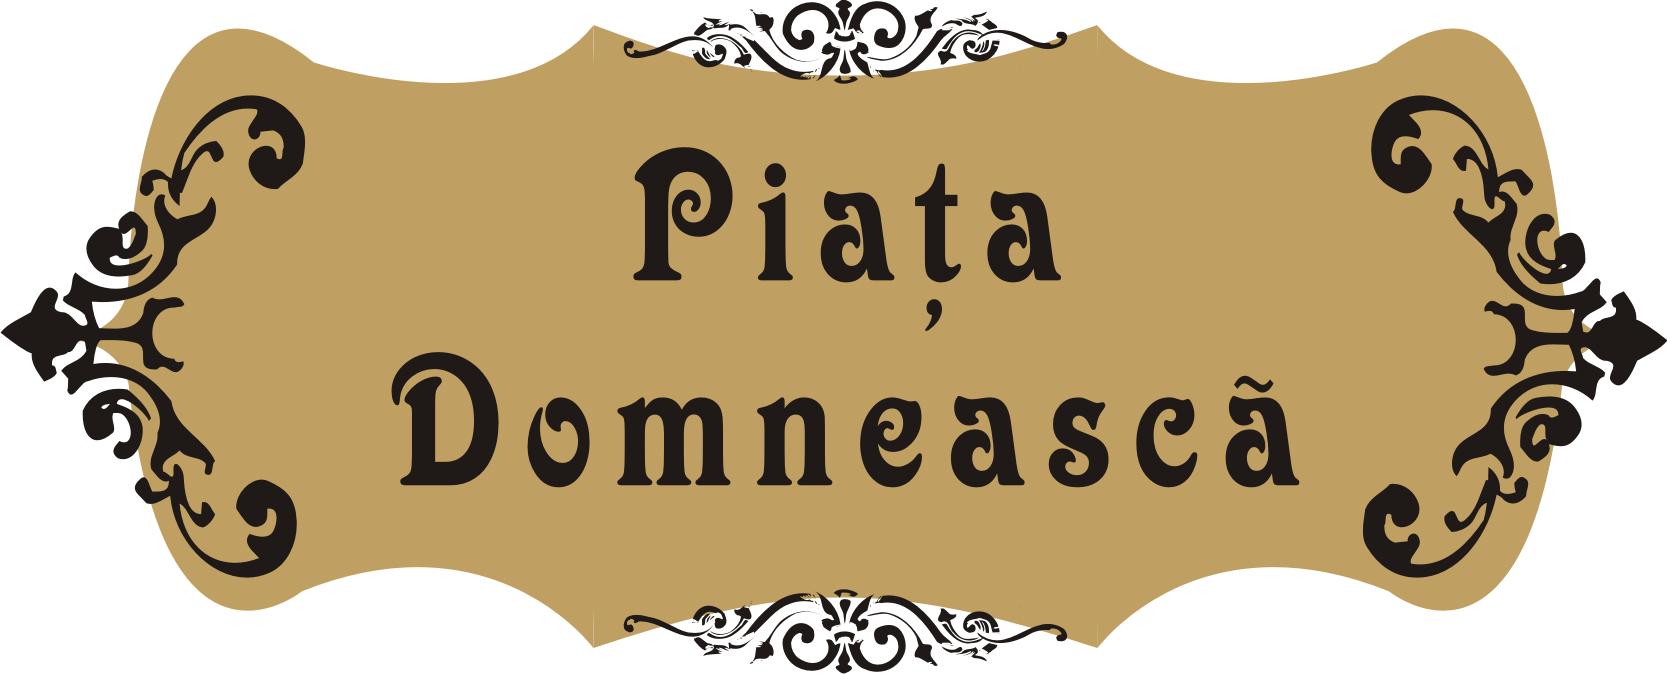 Piata Domneasca